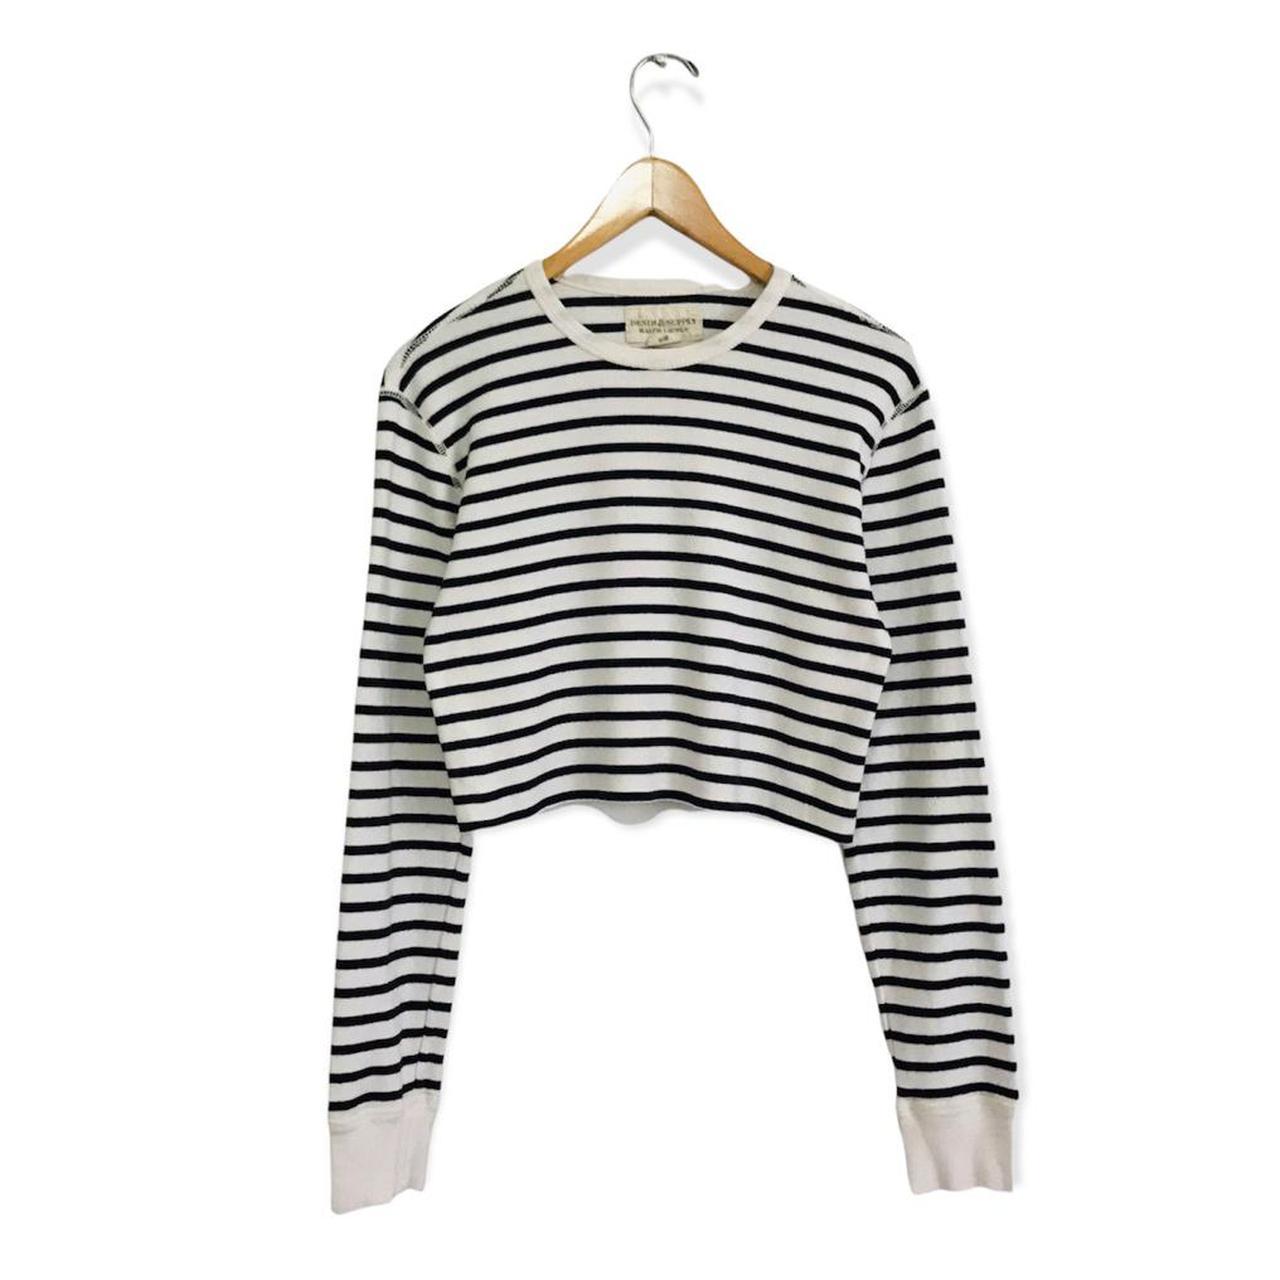 Product Image 1 - Black & White Crop Top  Super